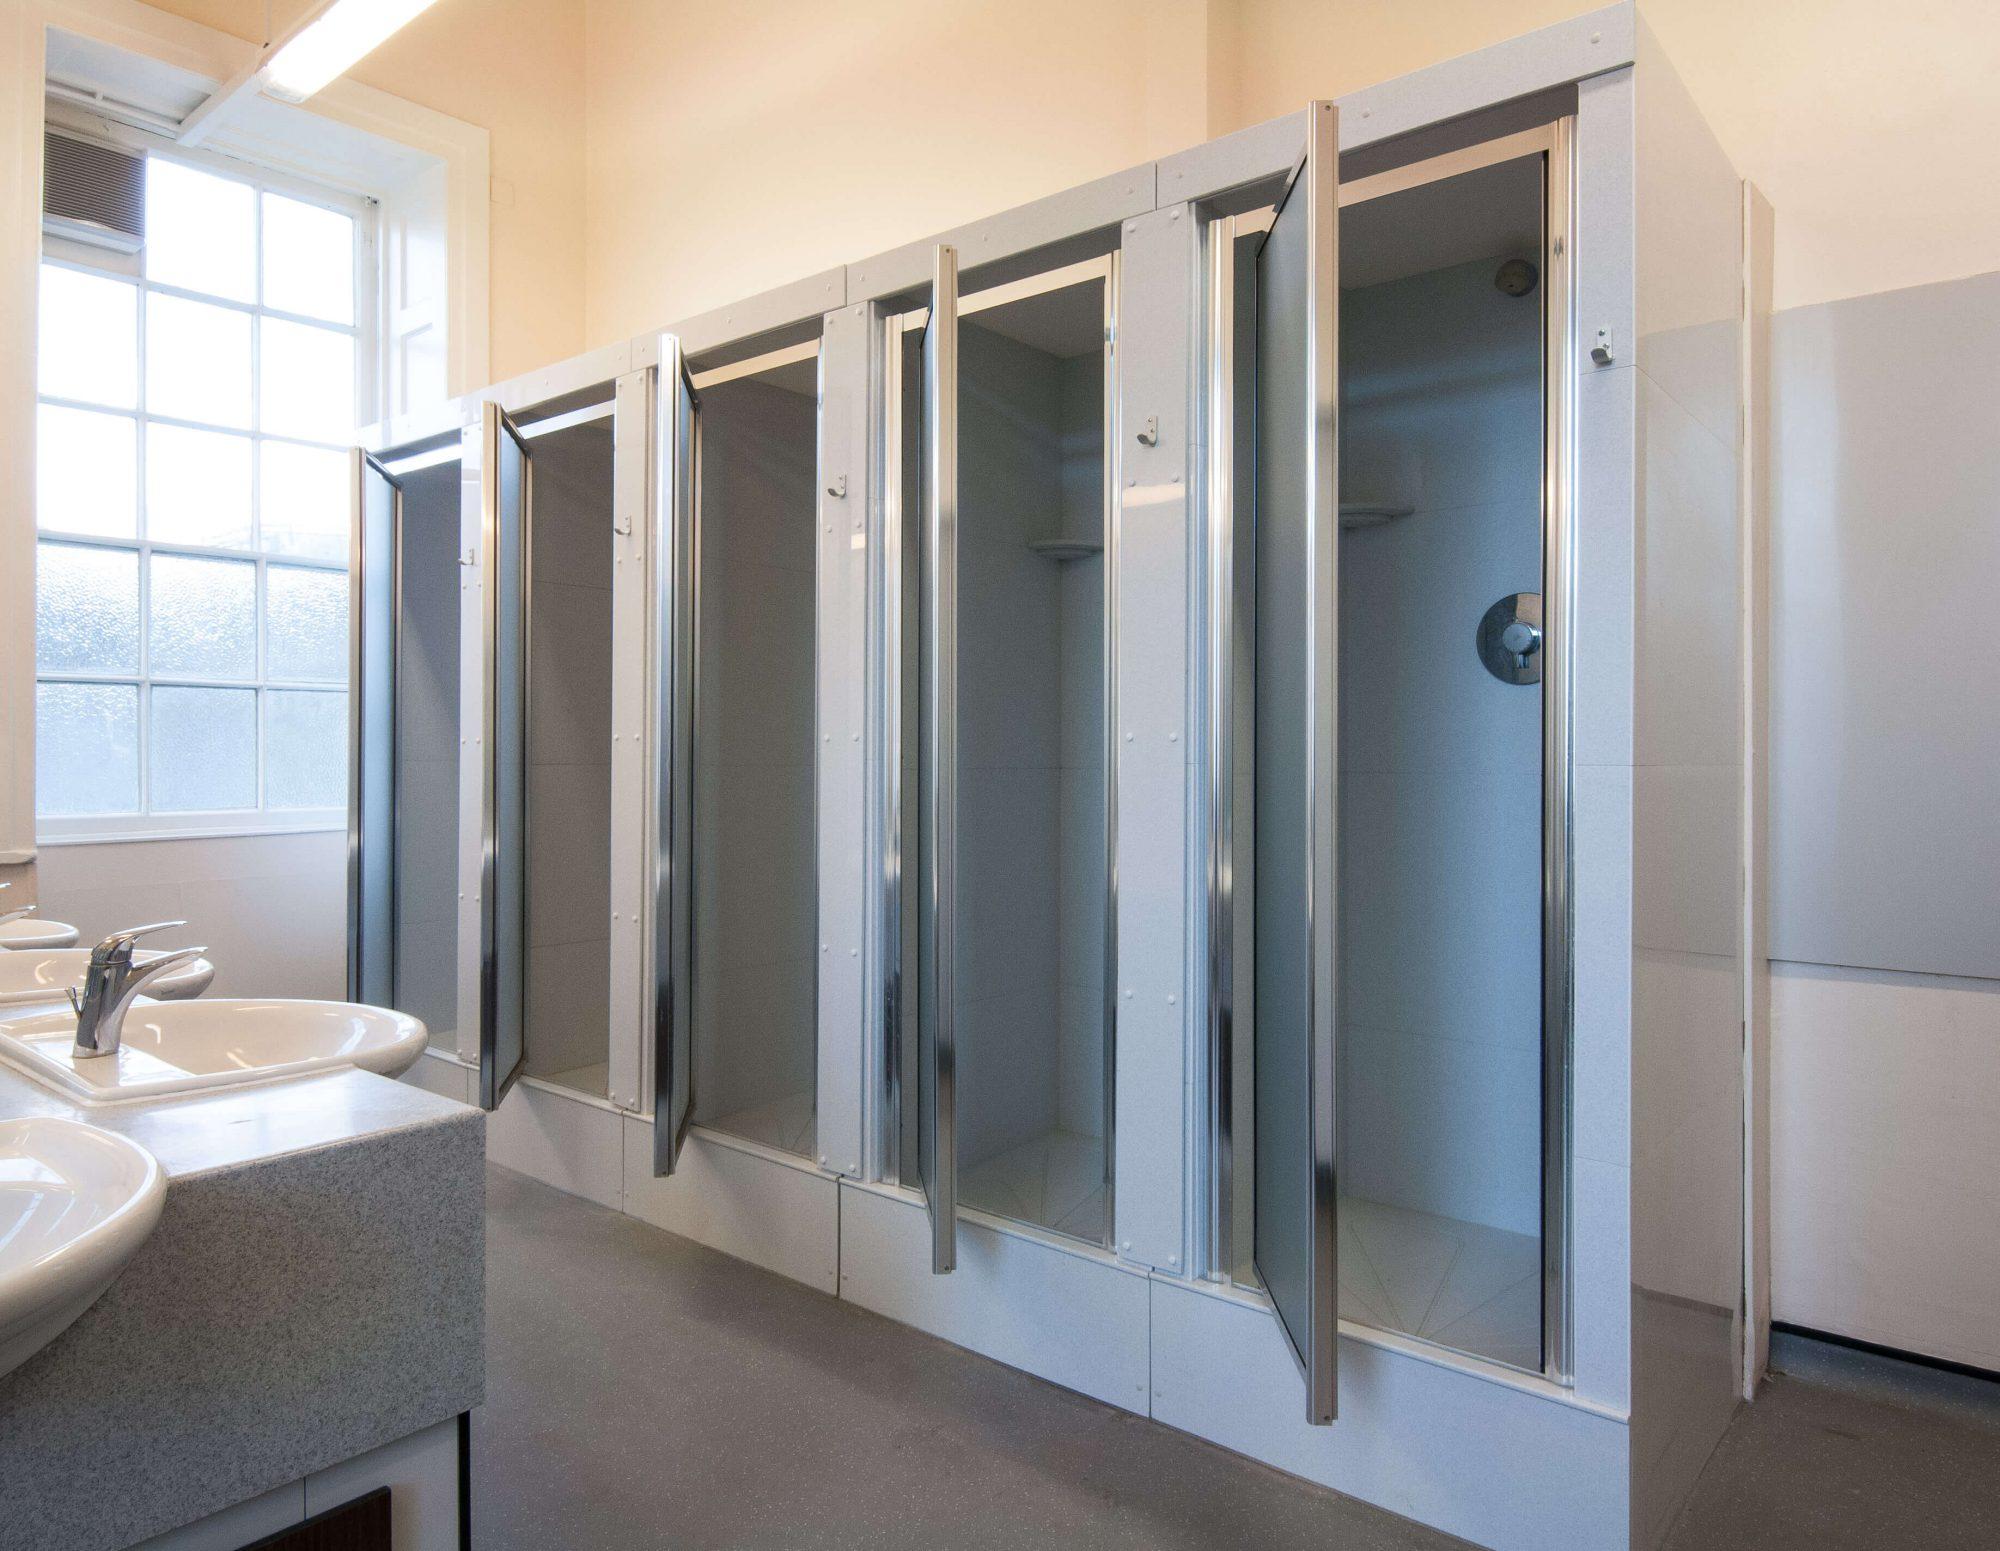 Stowe School washroom showers